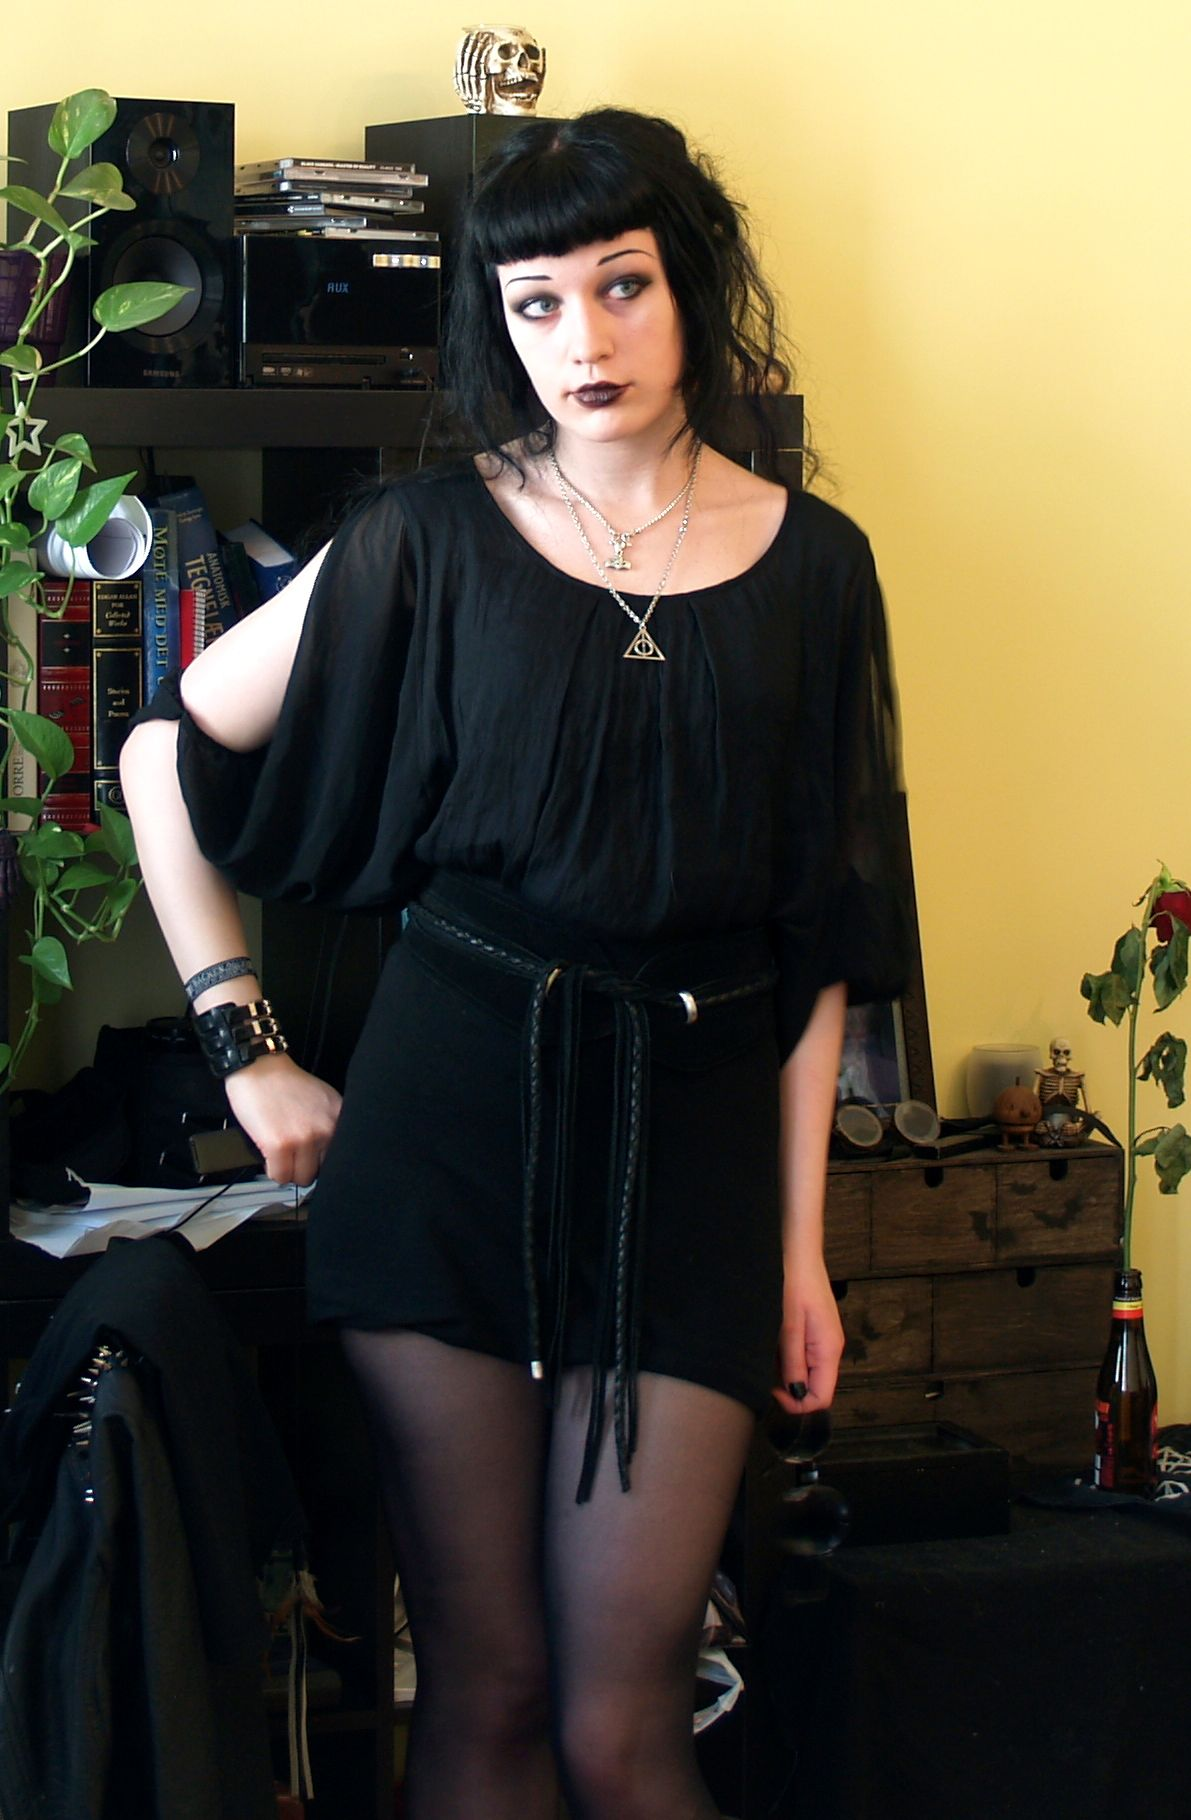 Casual Goth.